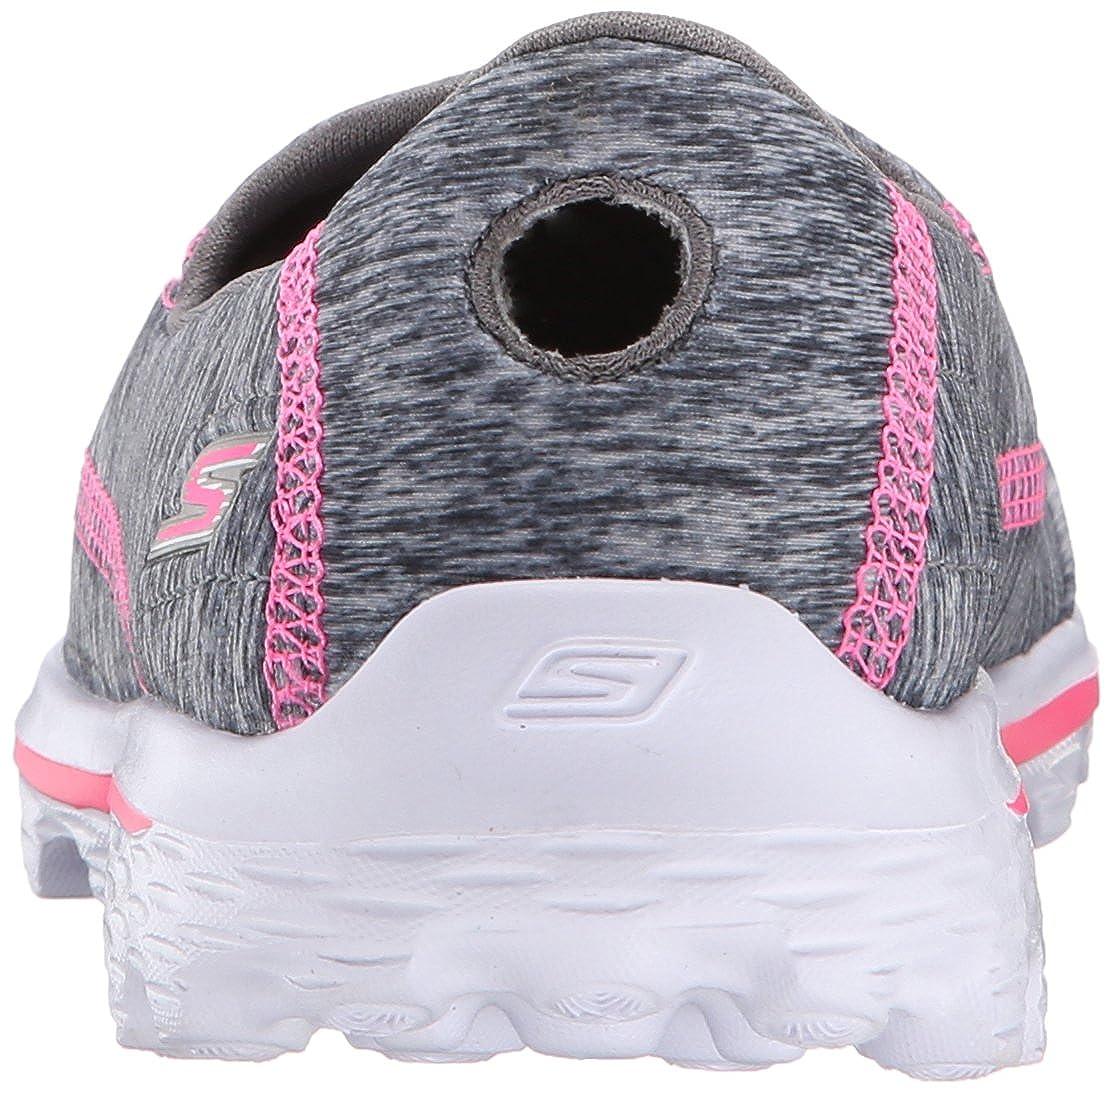 Skechers Kids Go Walk 2-Relay Athletic Athletic Athletic Slip On (Little Kid Big Kid) da3770